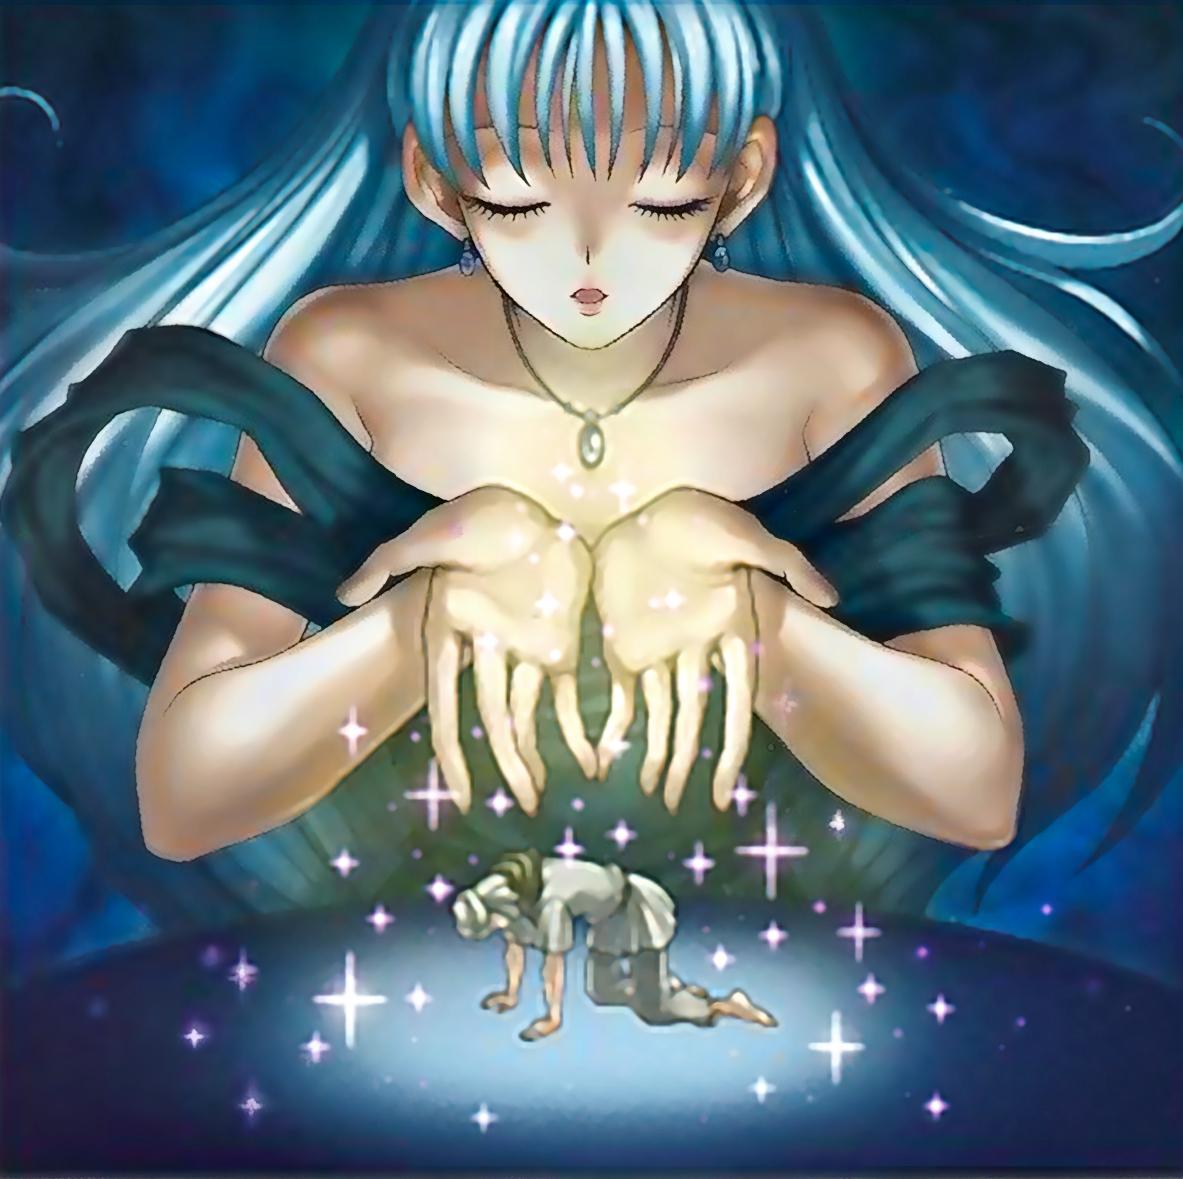 Guarded Treasure Artwork by Carlos123321